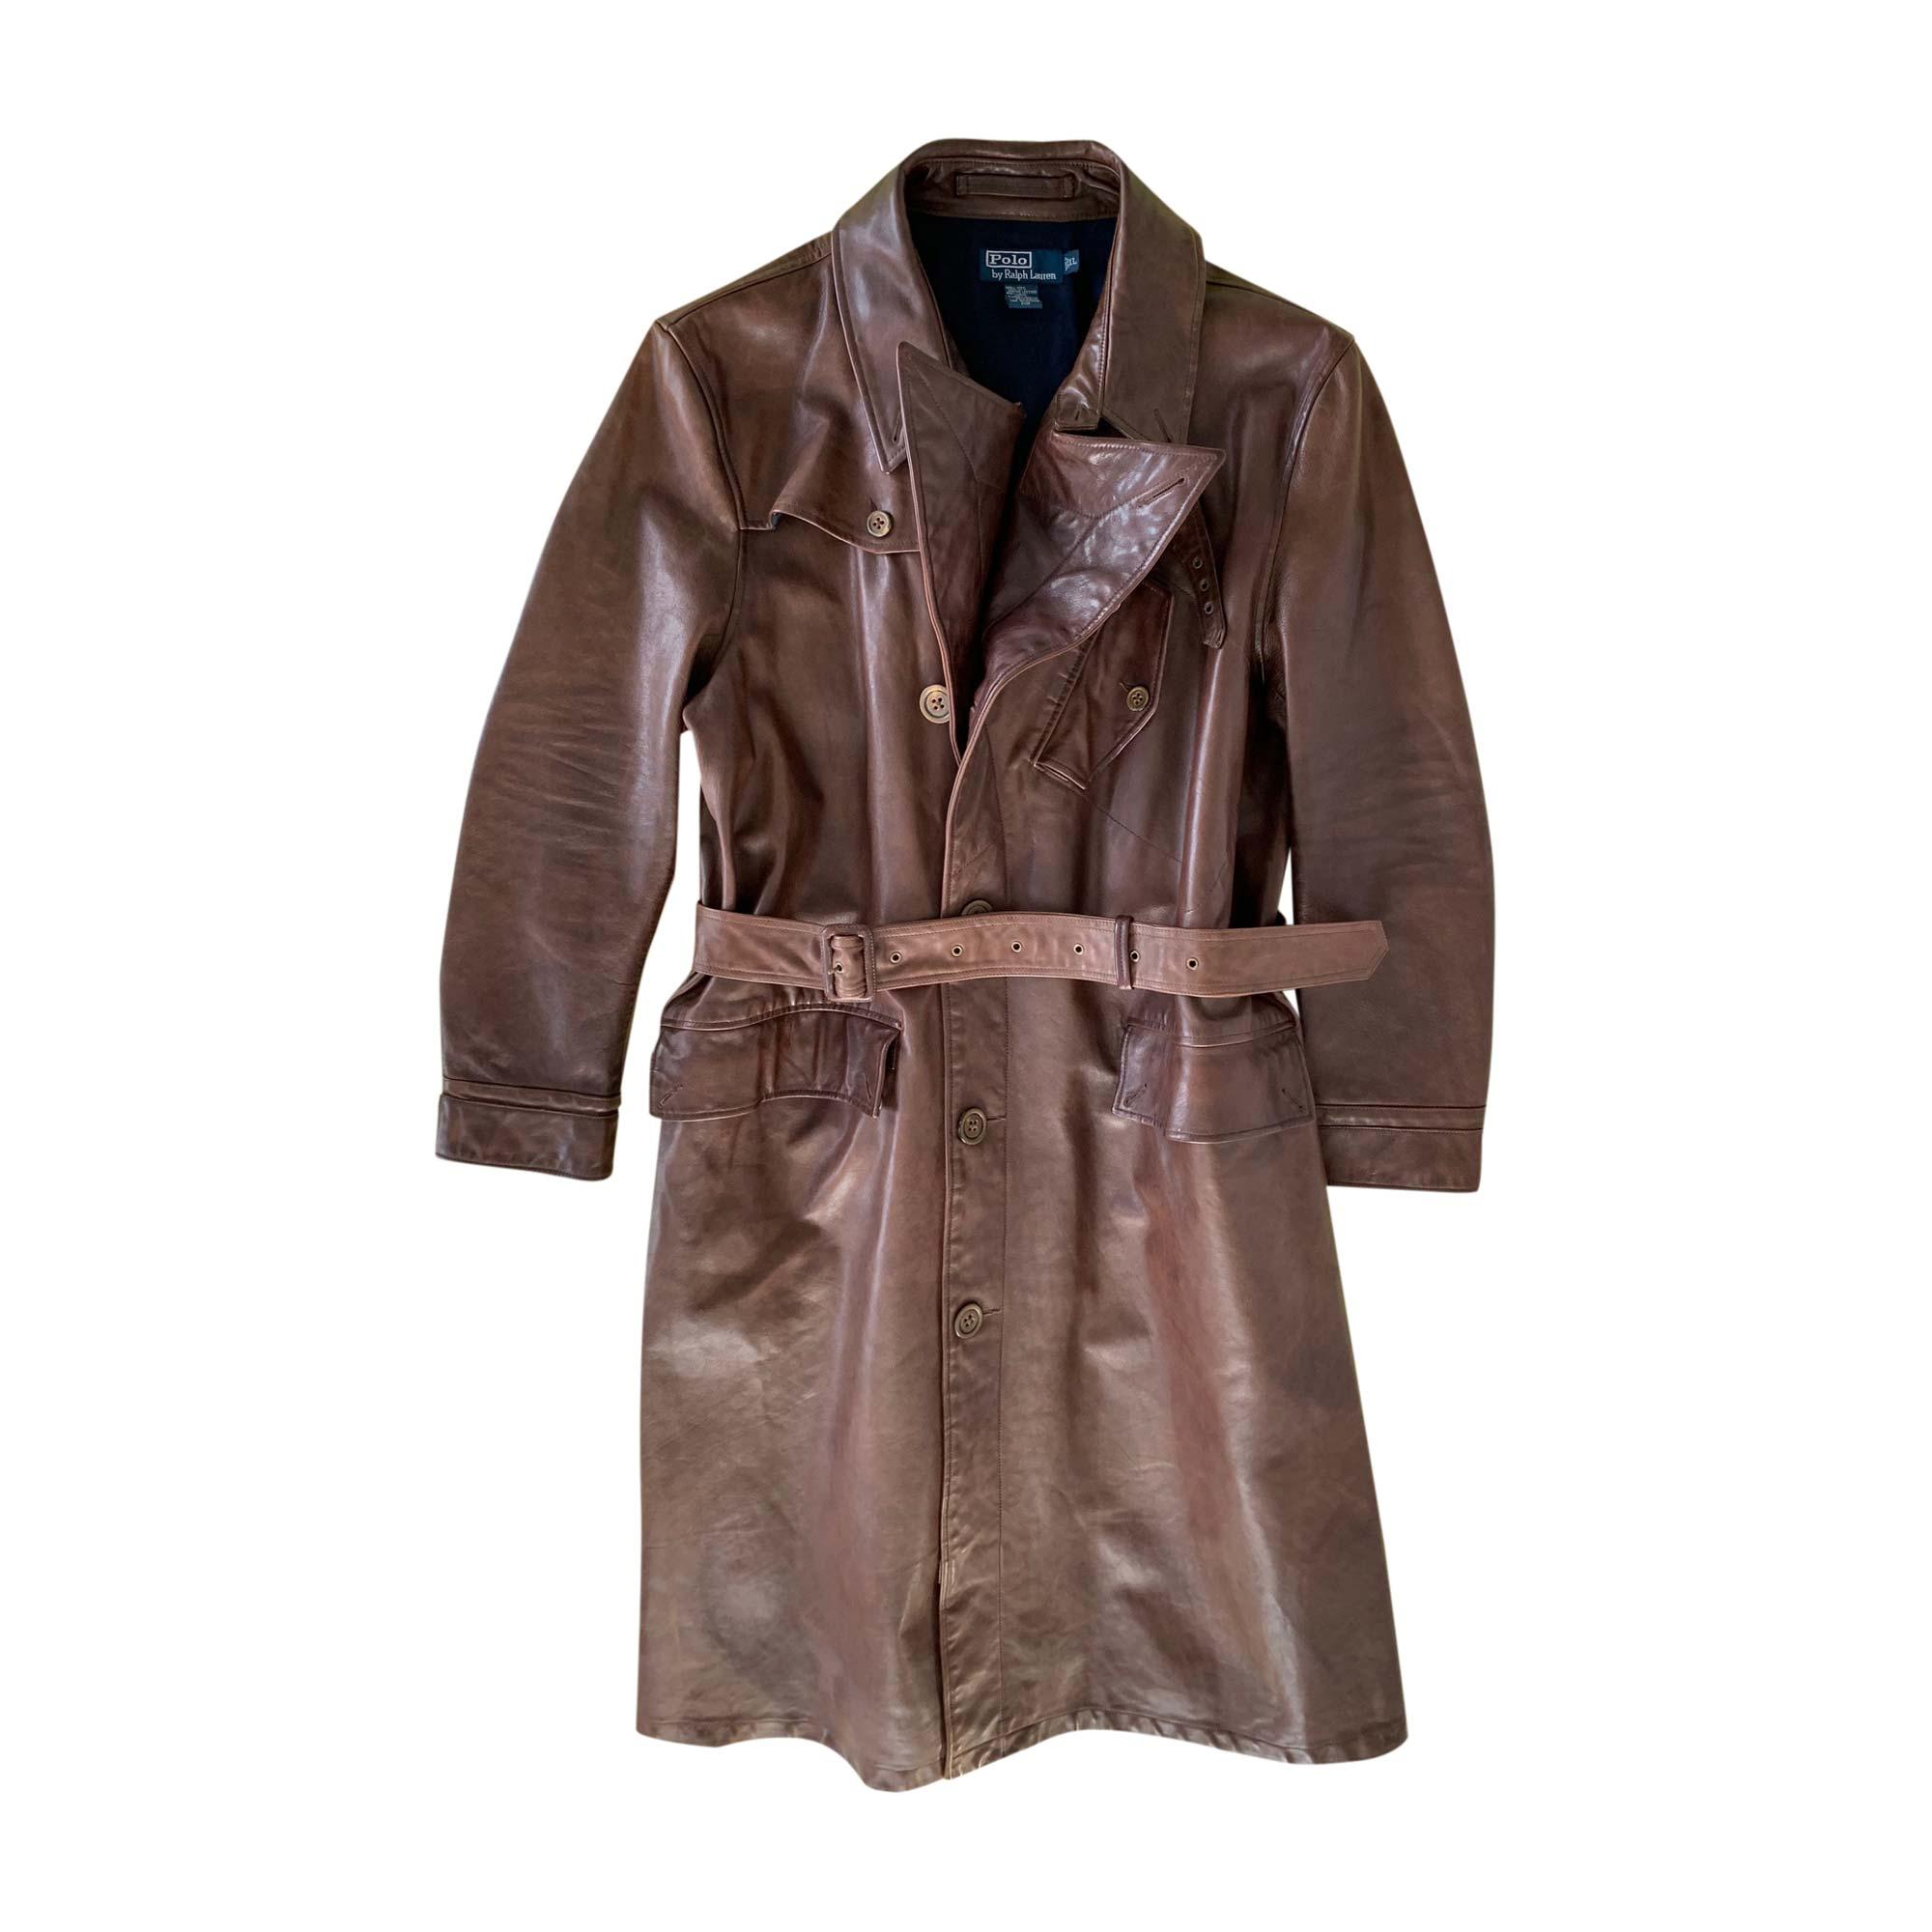 7be17d1de51 Manteau en cuir RALPH LAUREN 56 (XL) marron - 8508847